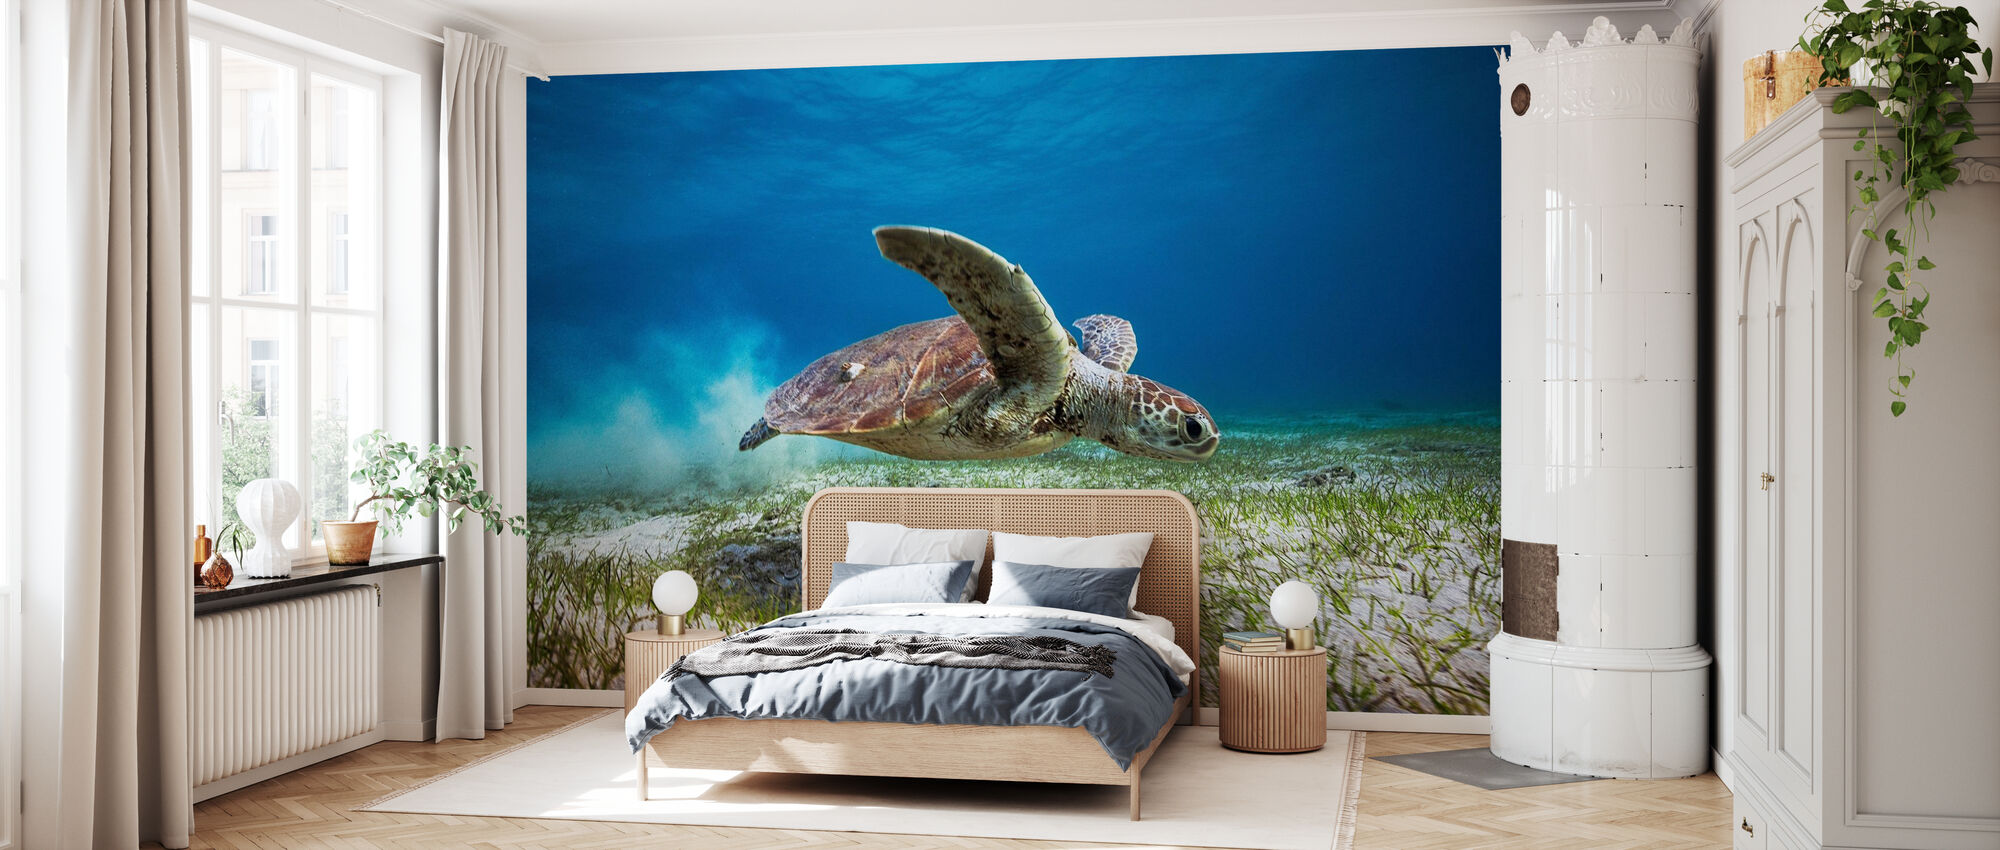 Take Off - Wallpaper - Bedroom